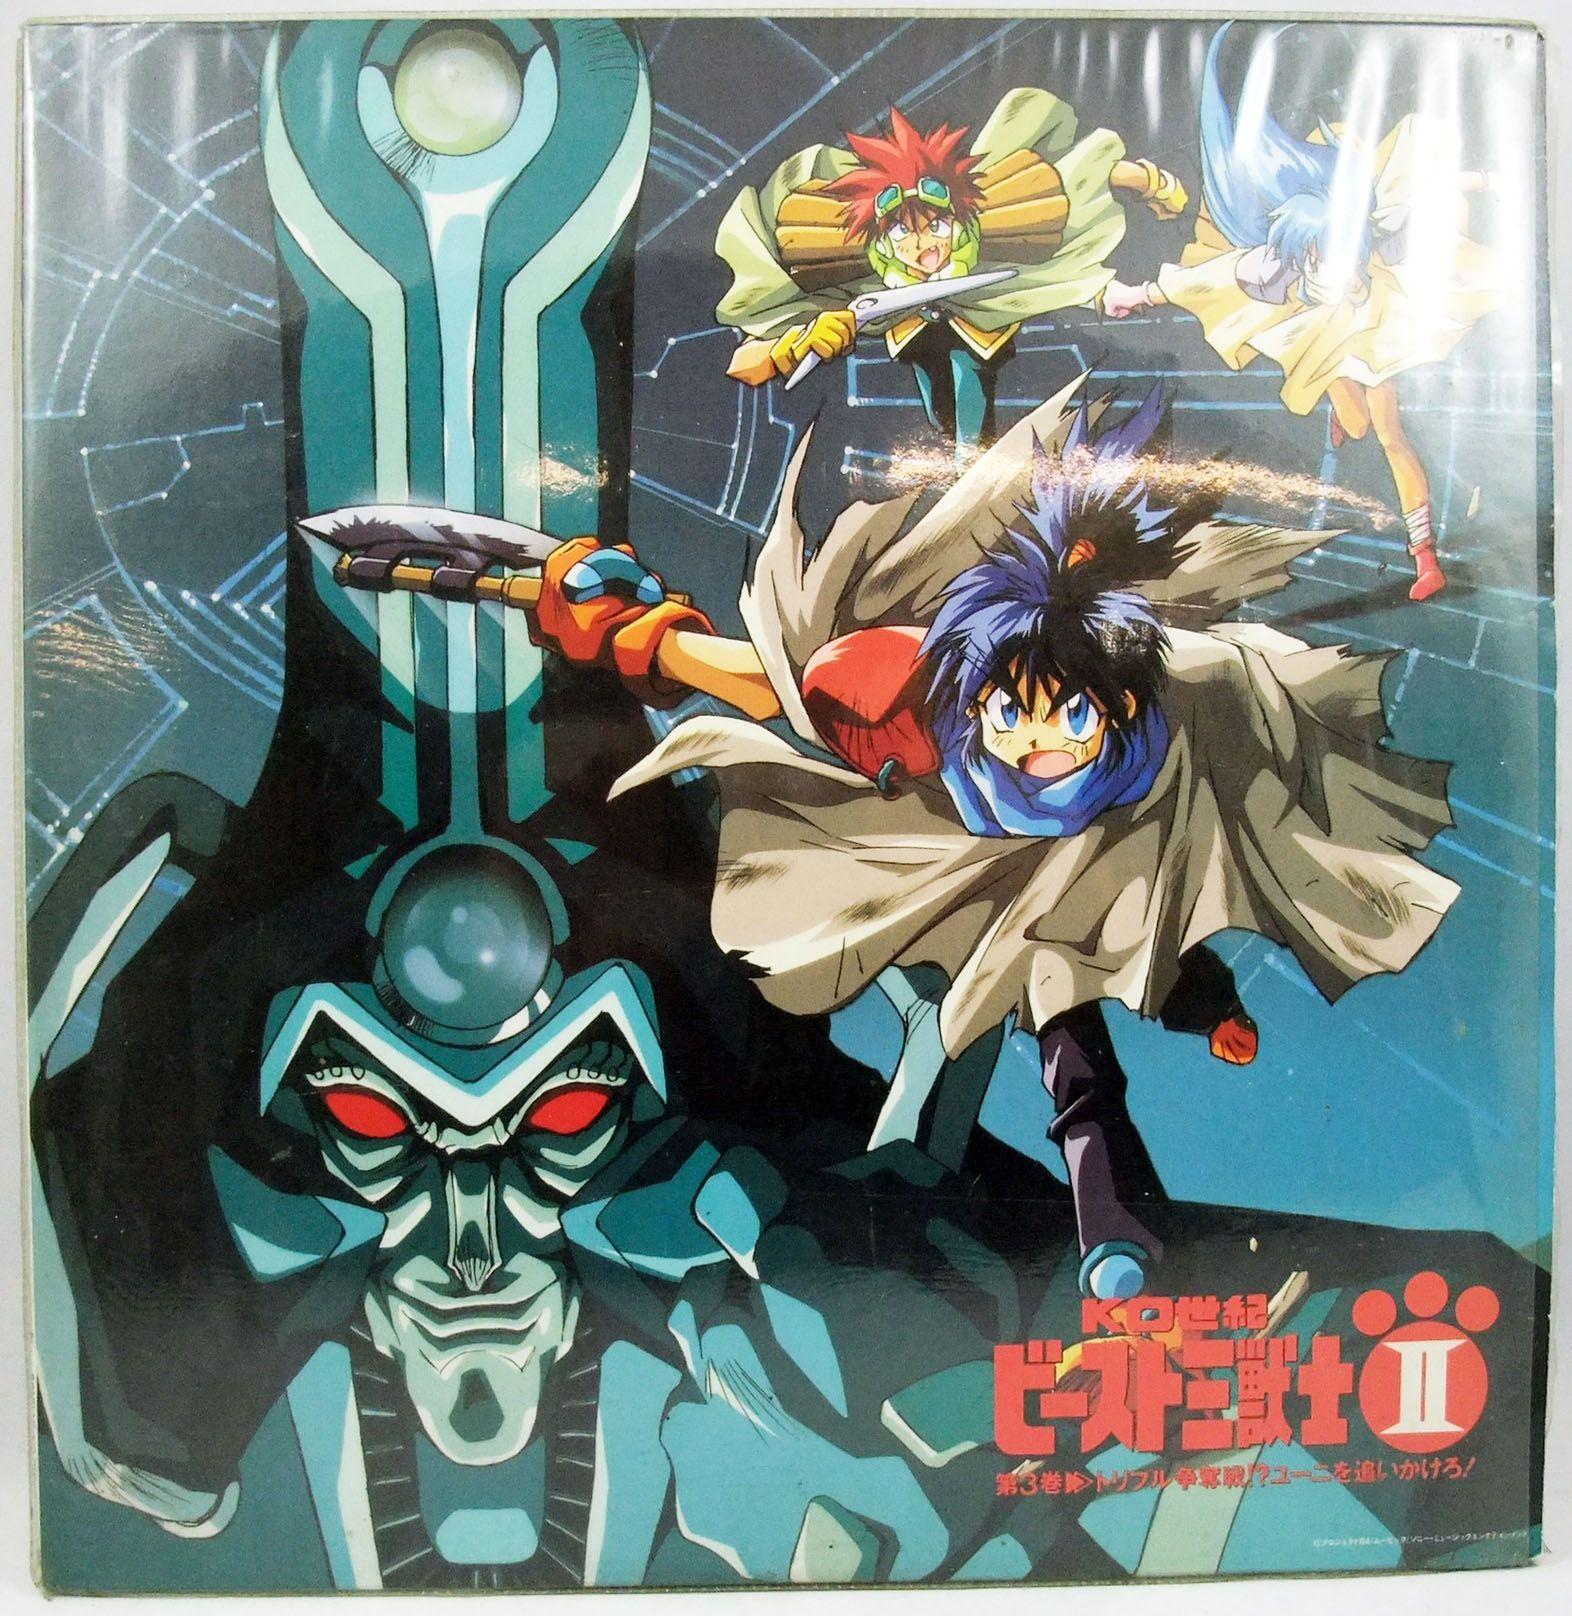 KO Century Beast Three II - Video Laser Disc - Sony Music Entertainment 1993